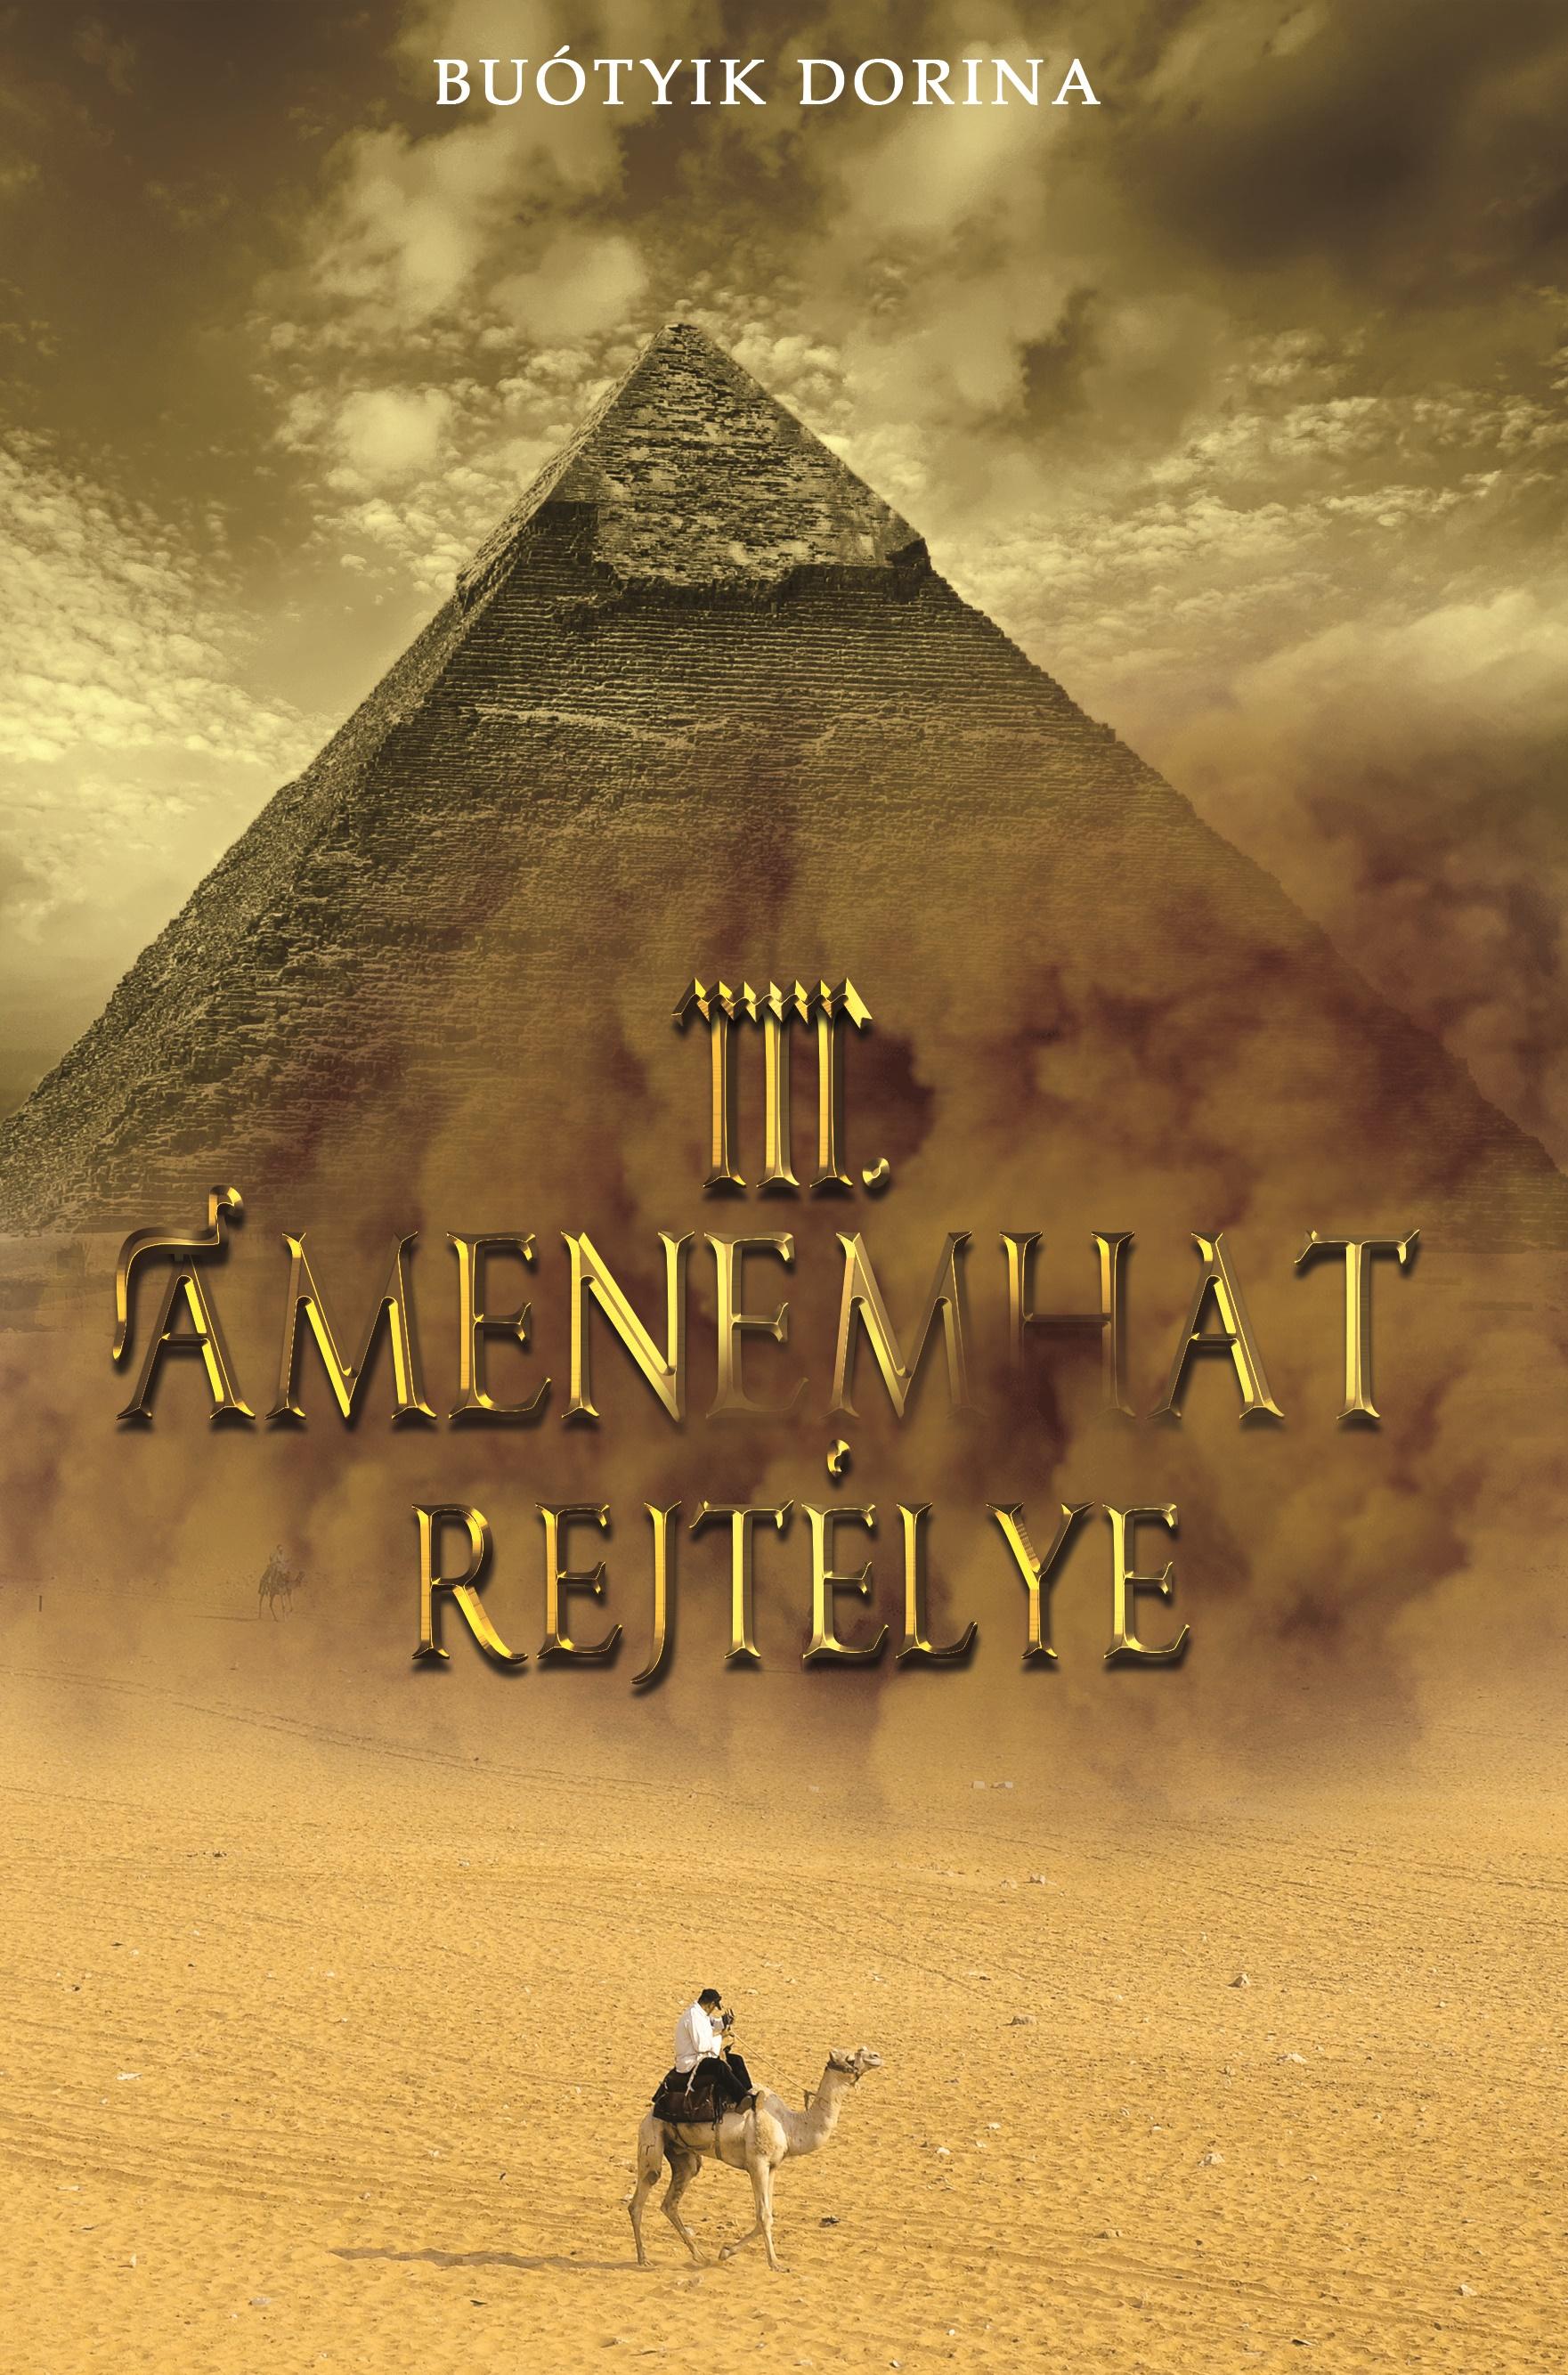 Buótyik Dorina - III. Amenemhat rejtélye